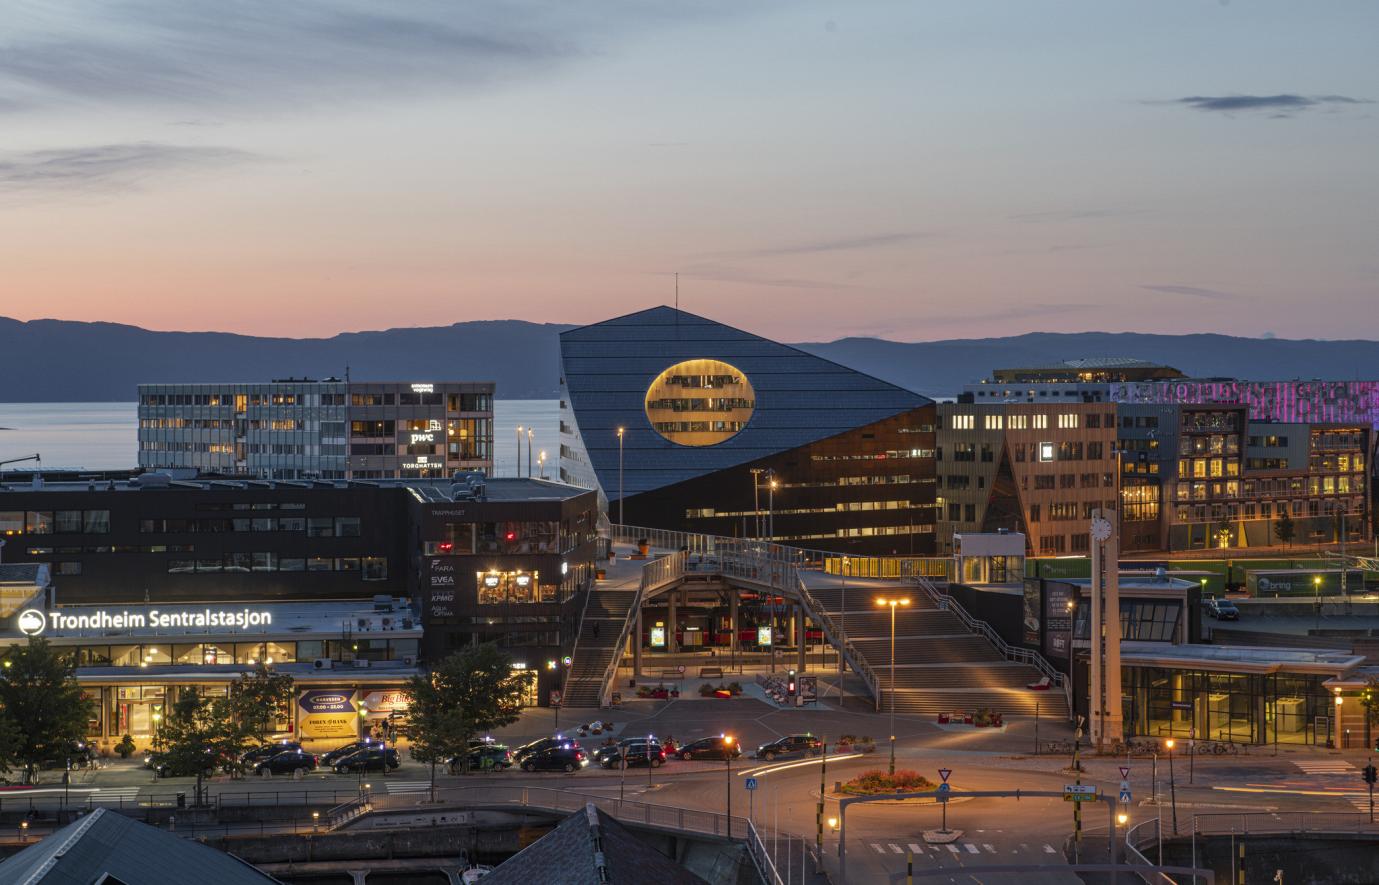 Cooper Hewitt's 2020 National Design Awards, Architecture Prize won by Snøhetta